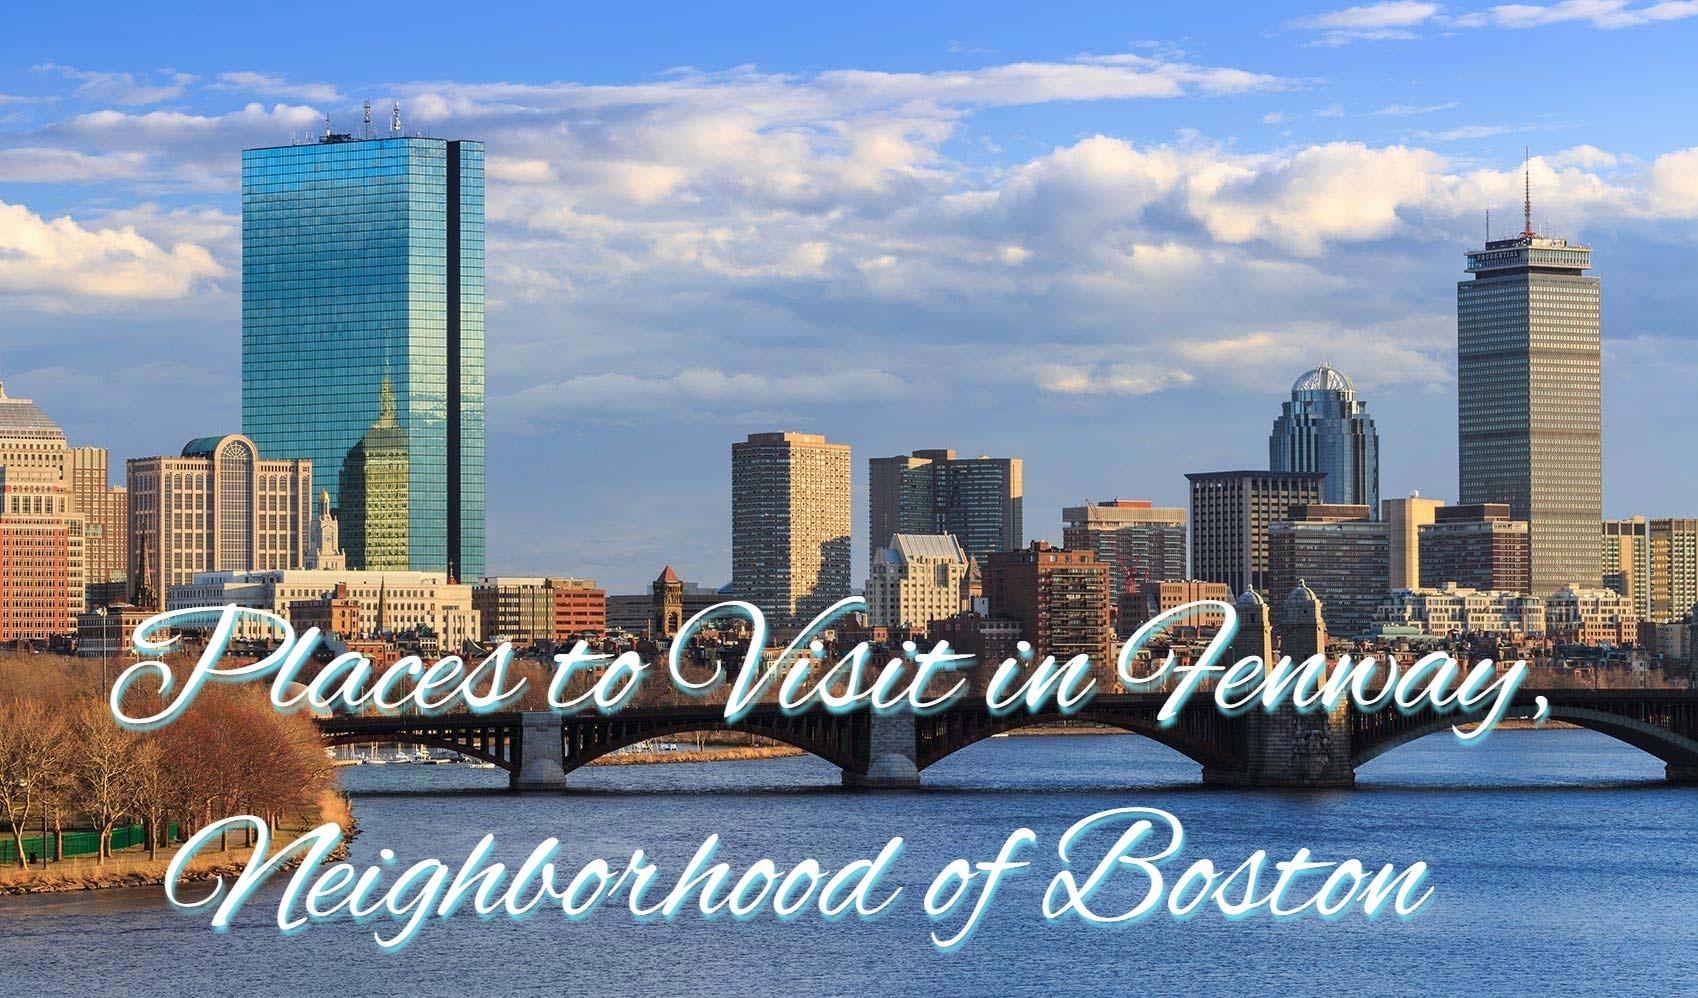 visit Neighborhood of Boston